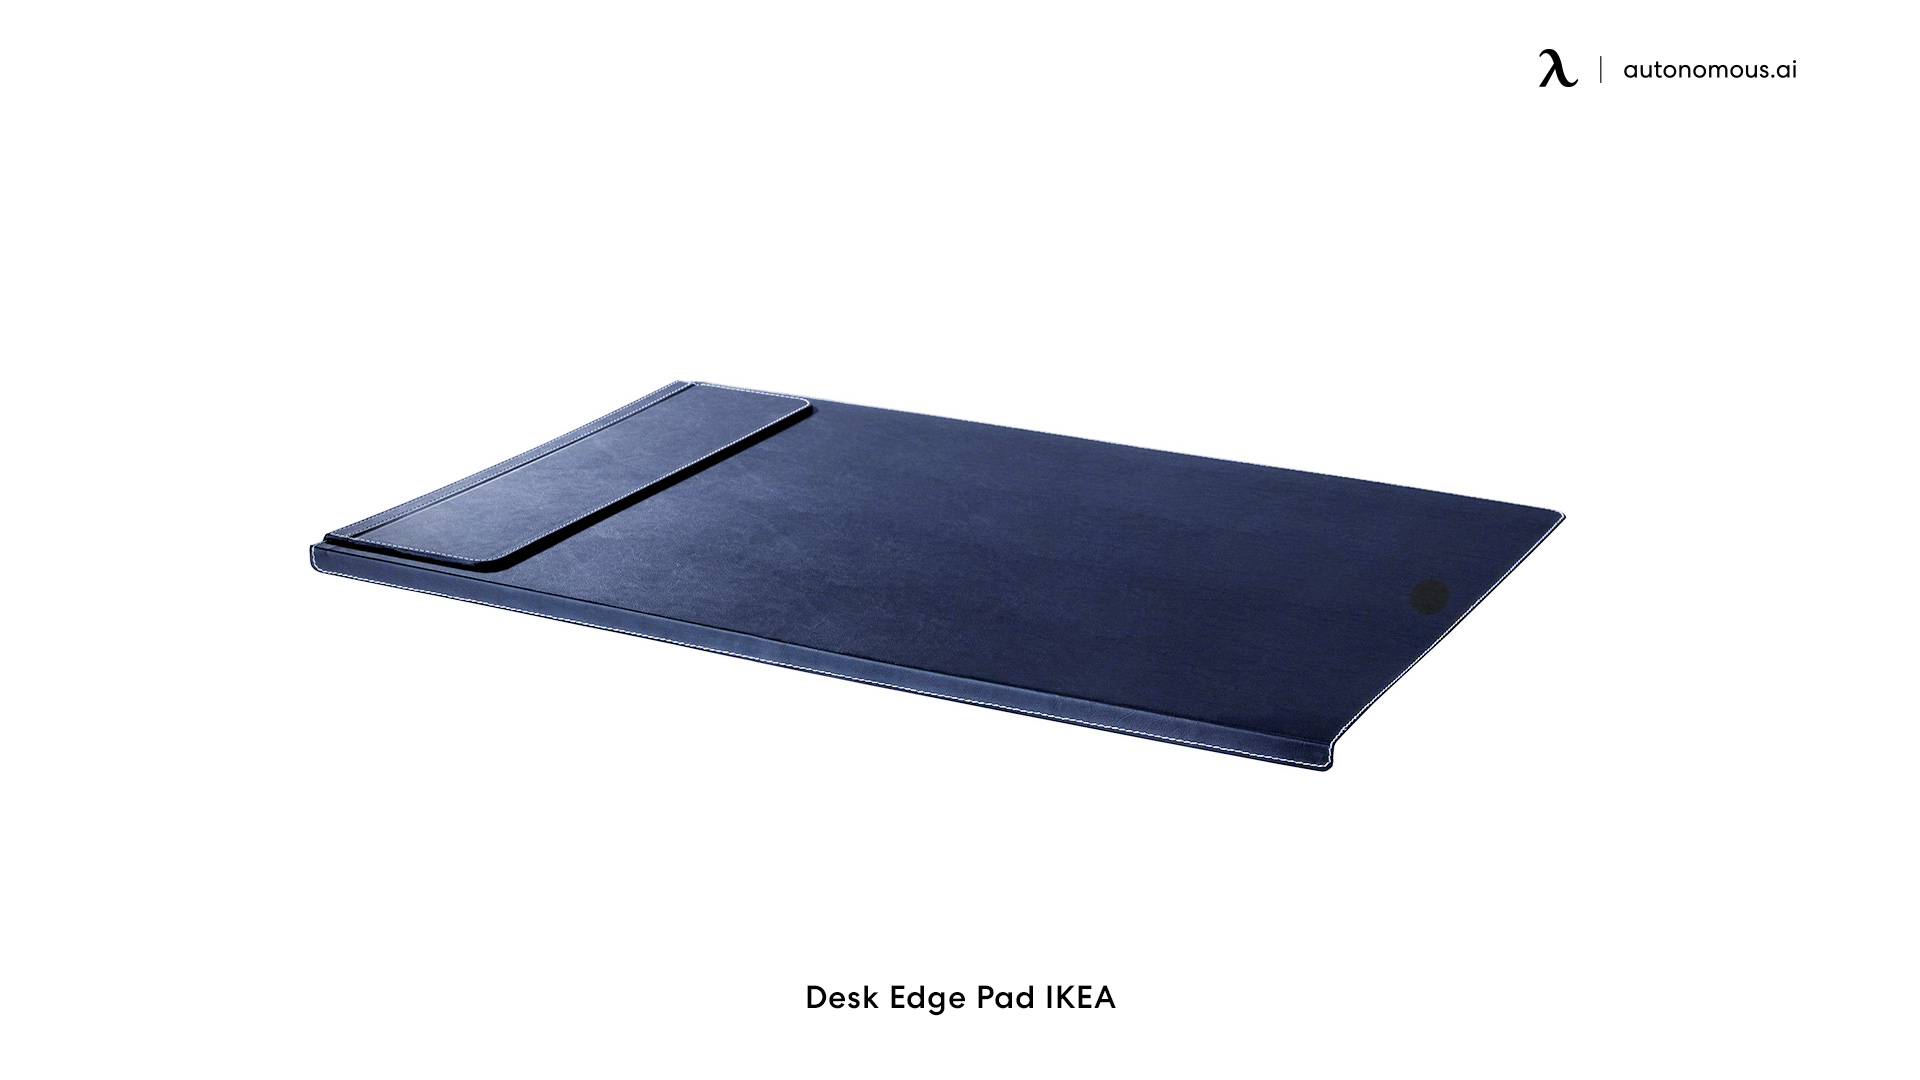 Desk Edge Pad